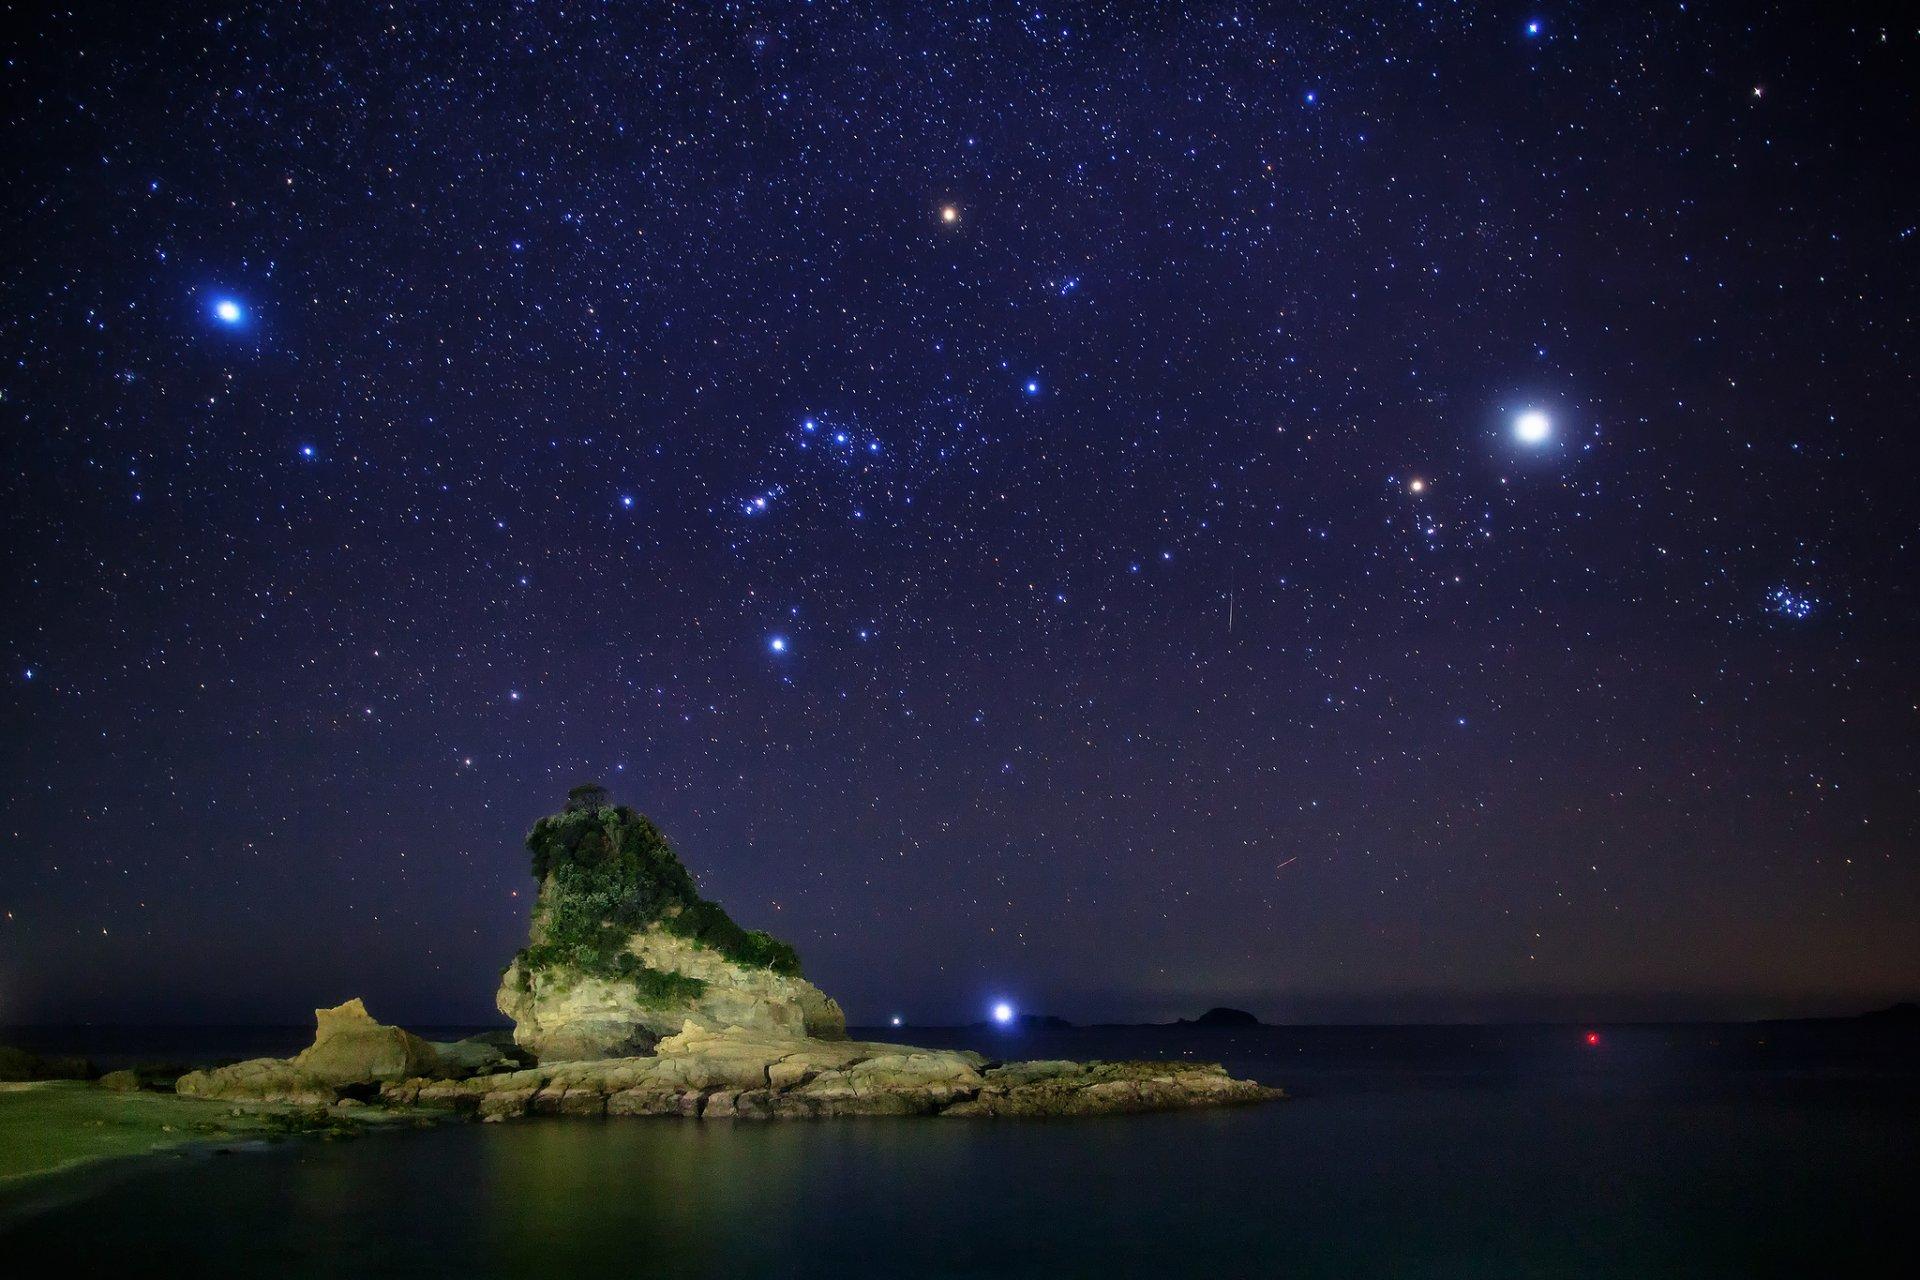 Квартиру, звездная ночь картинки